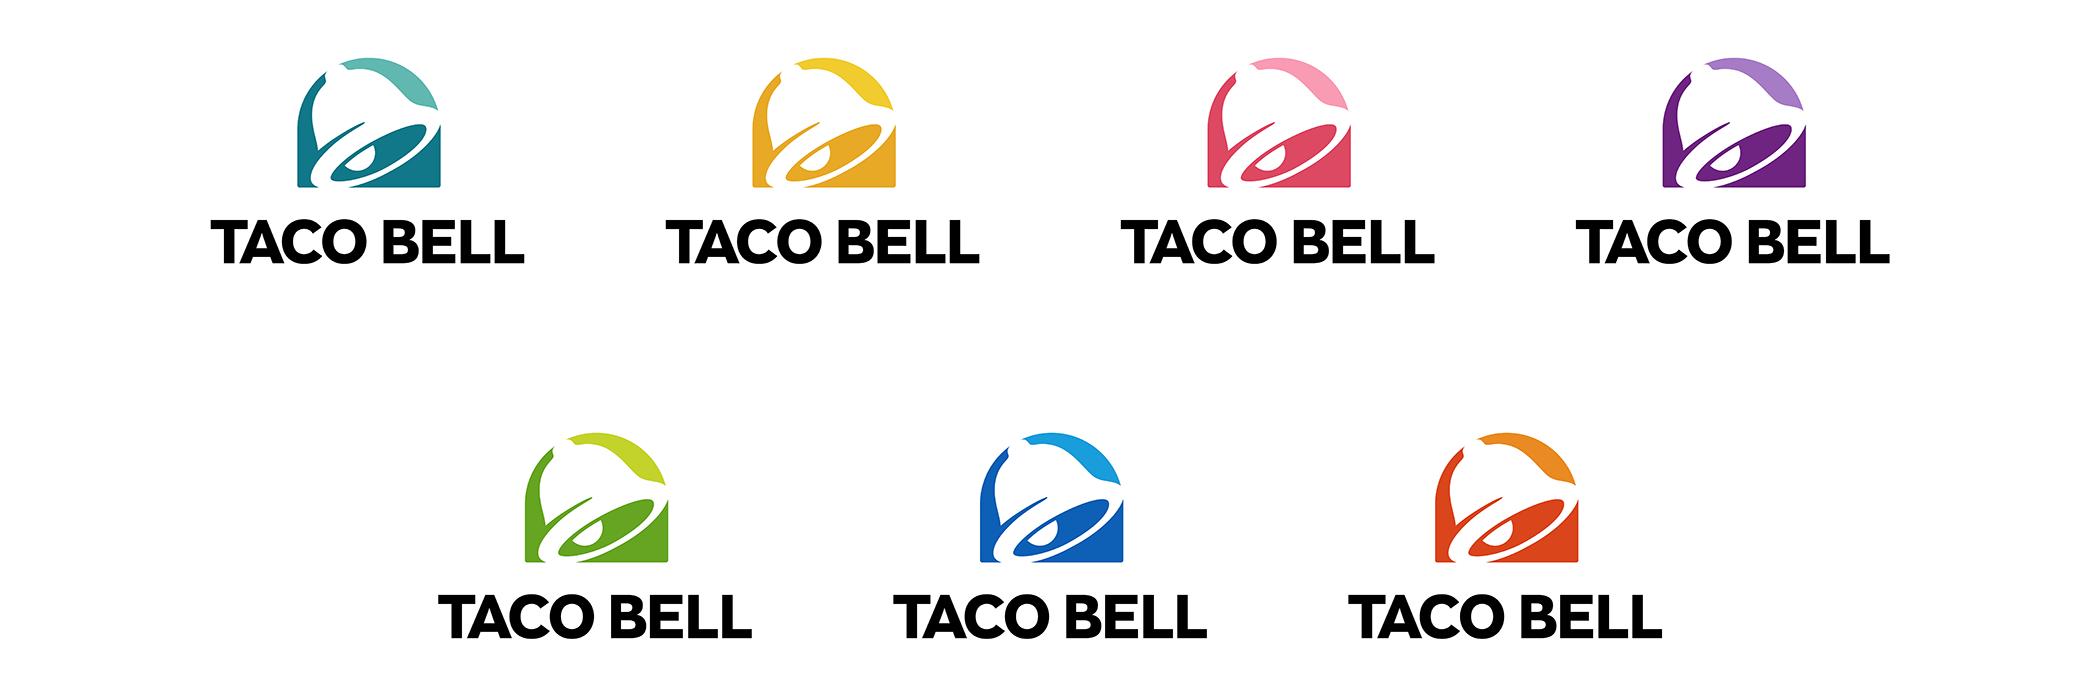 taco bell application form - Heart.impulsar.co